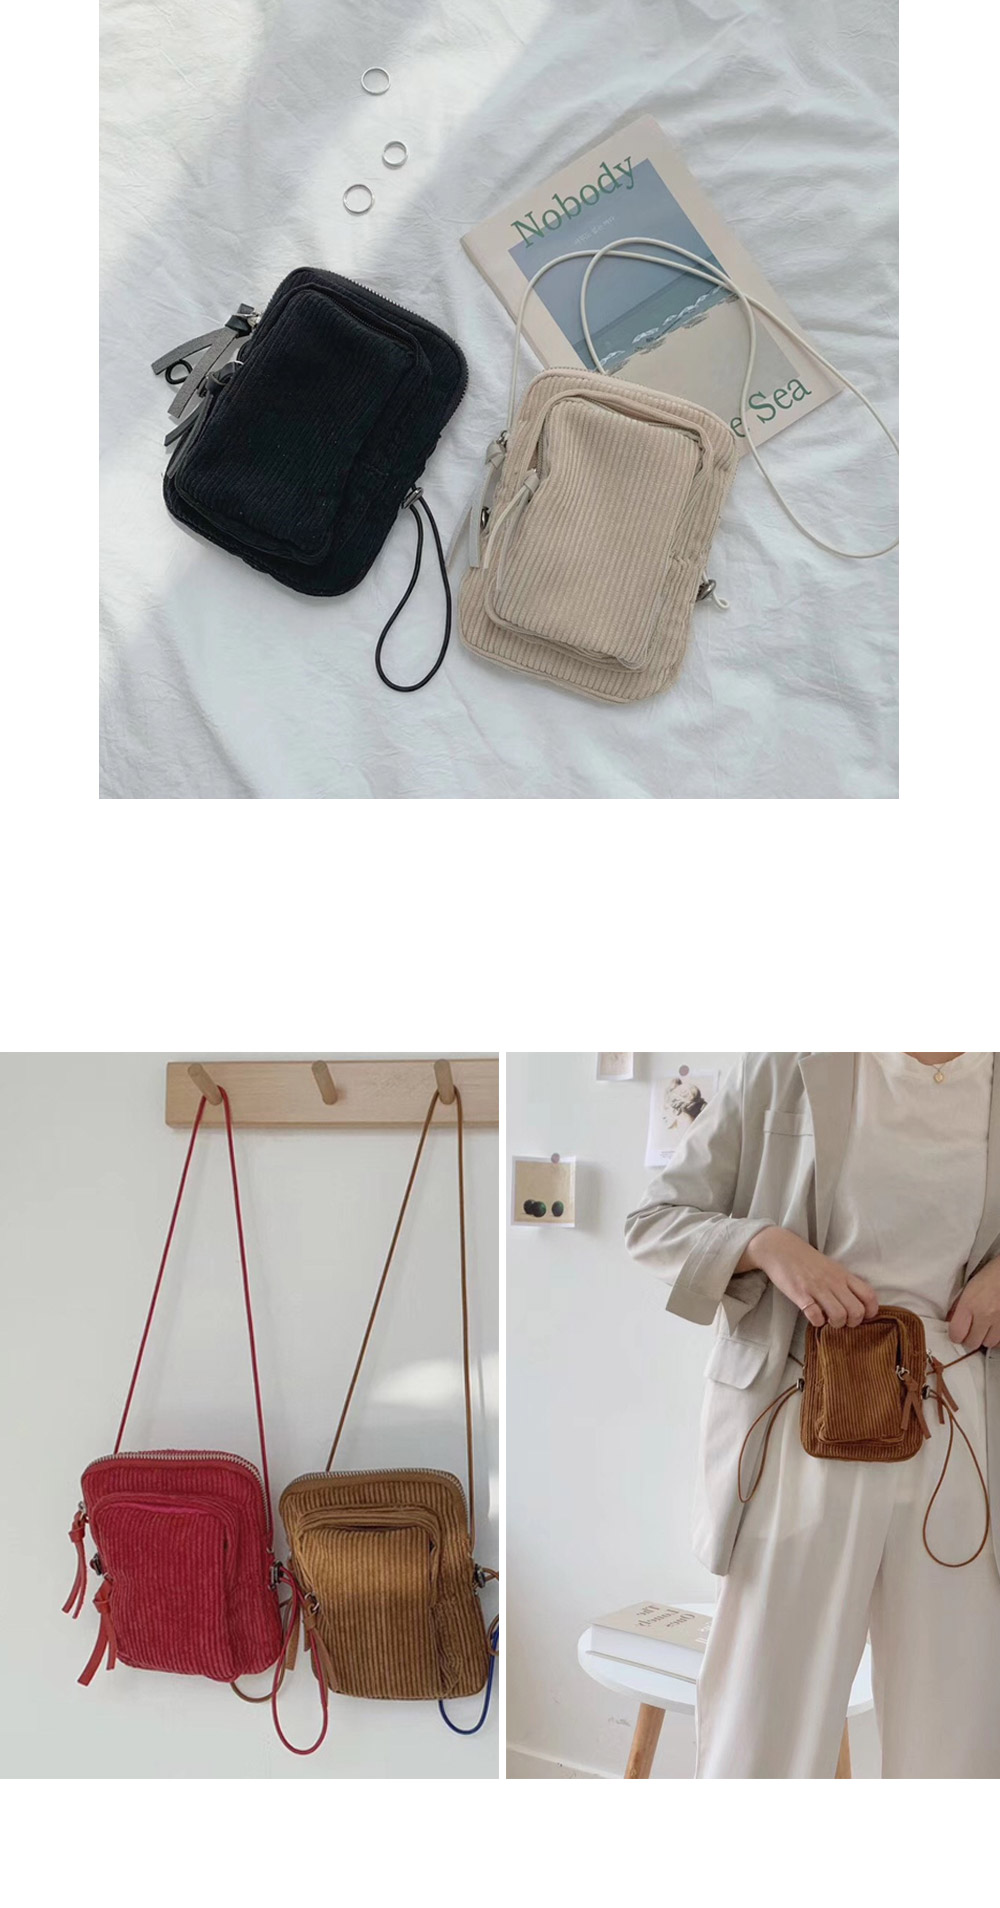 bag035c99l_03.jpg